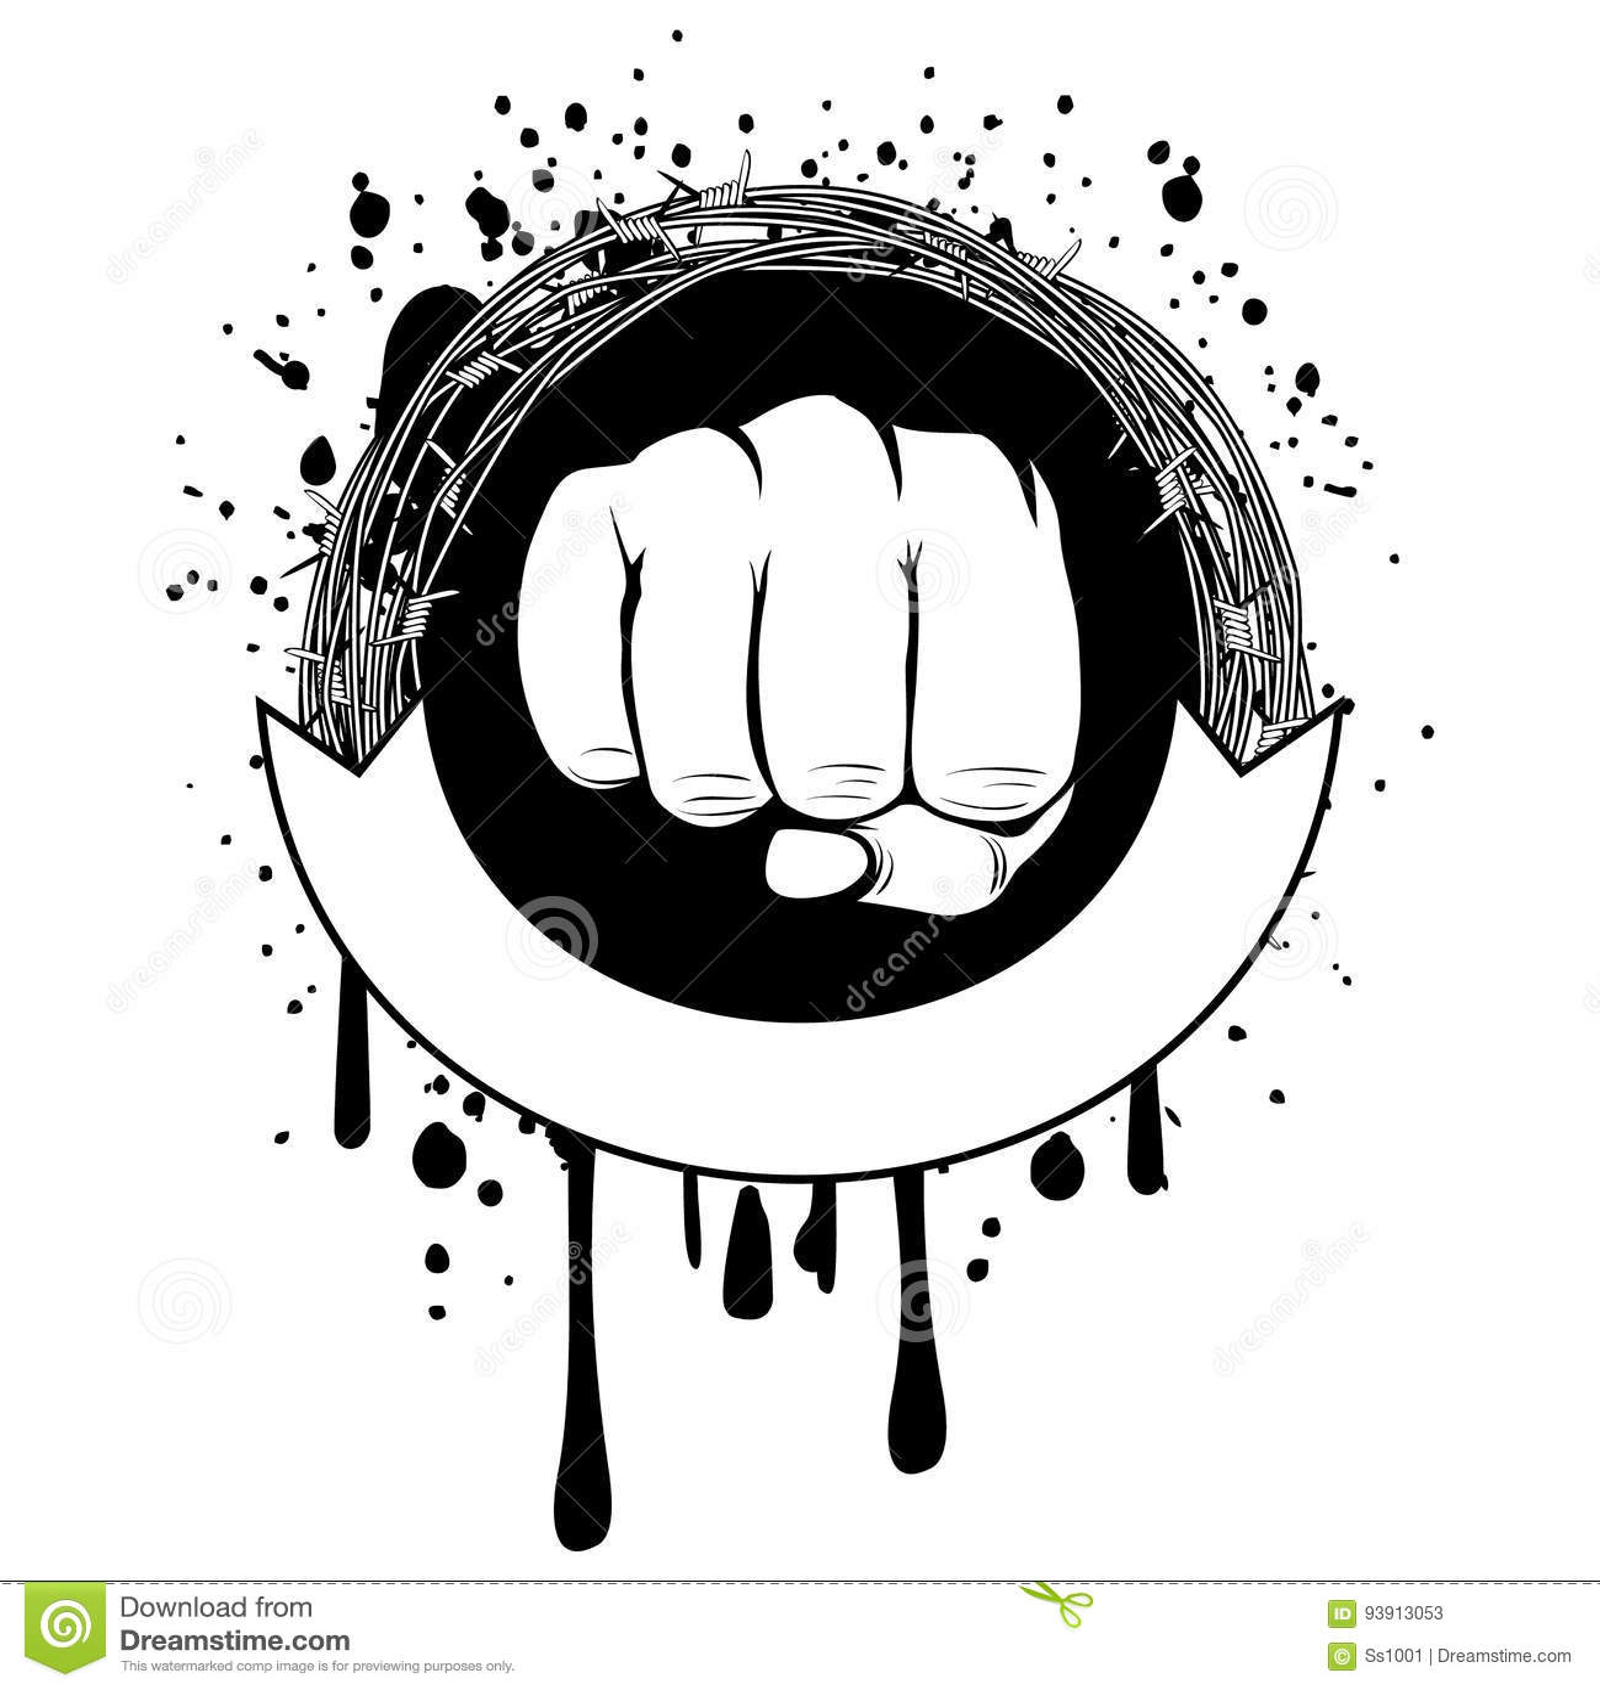 Fist stock vector. Illustration of brawler, military - 93913053